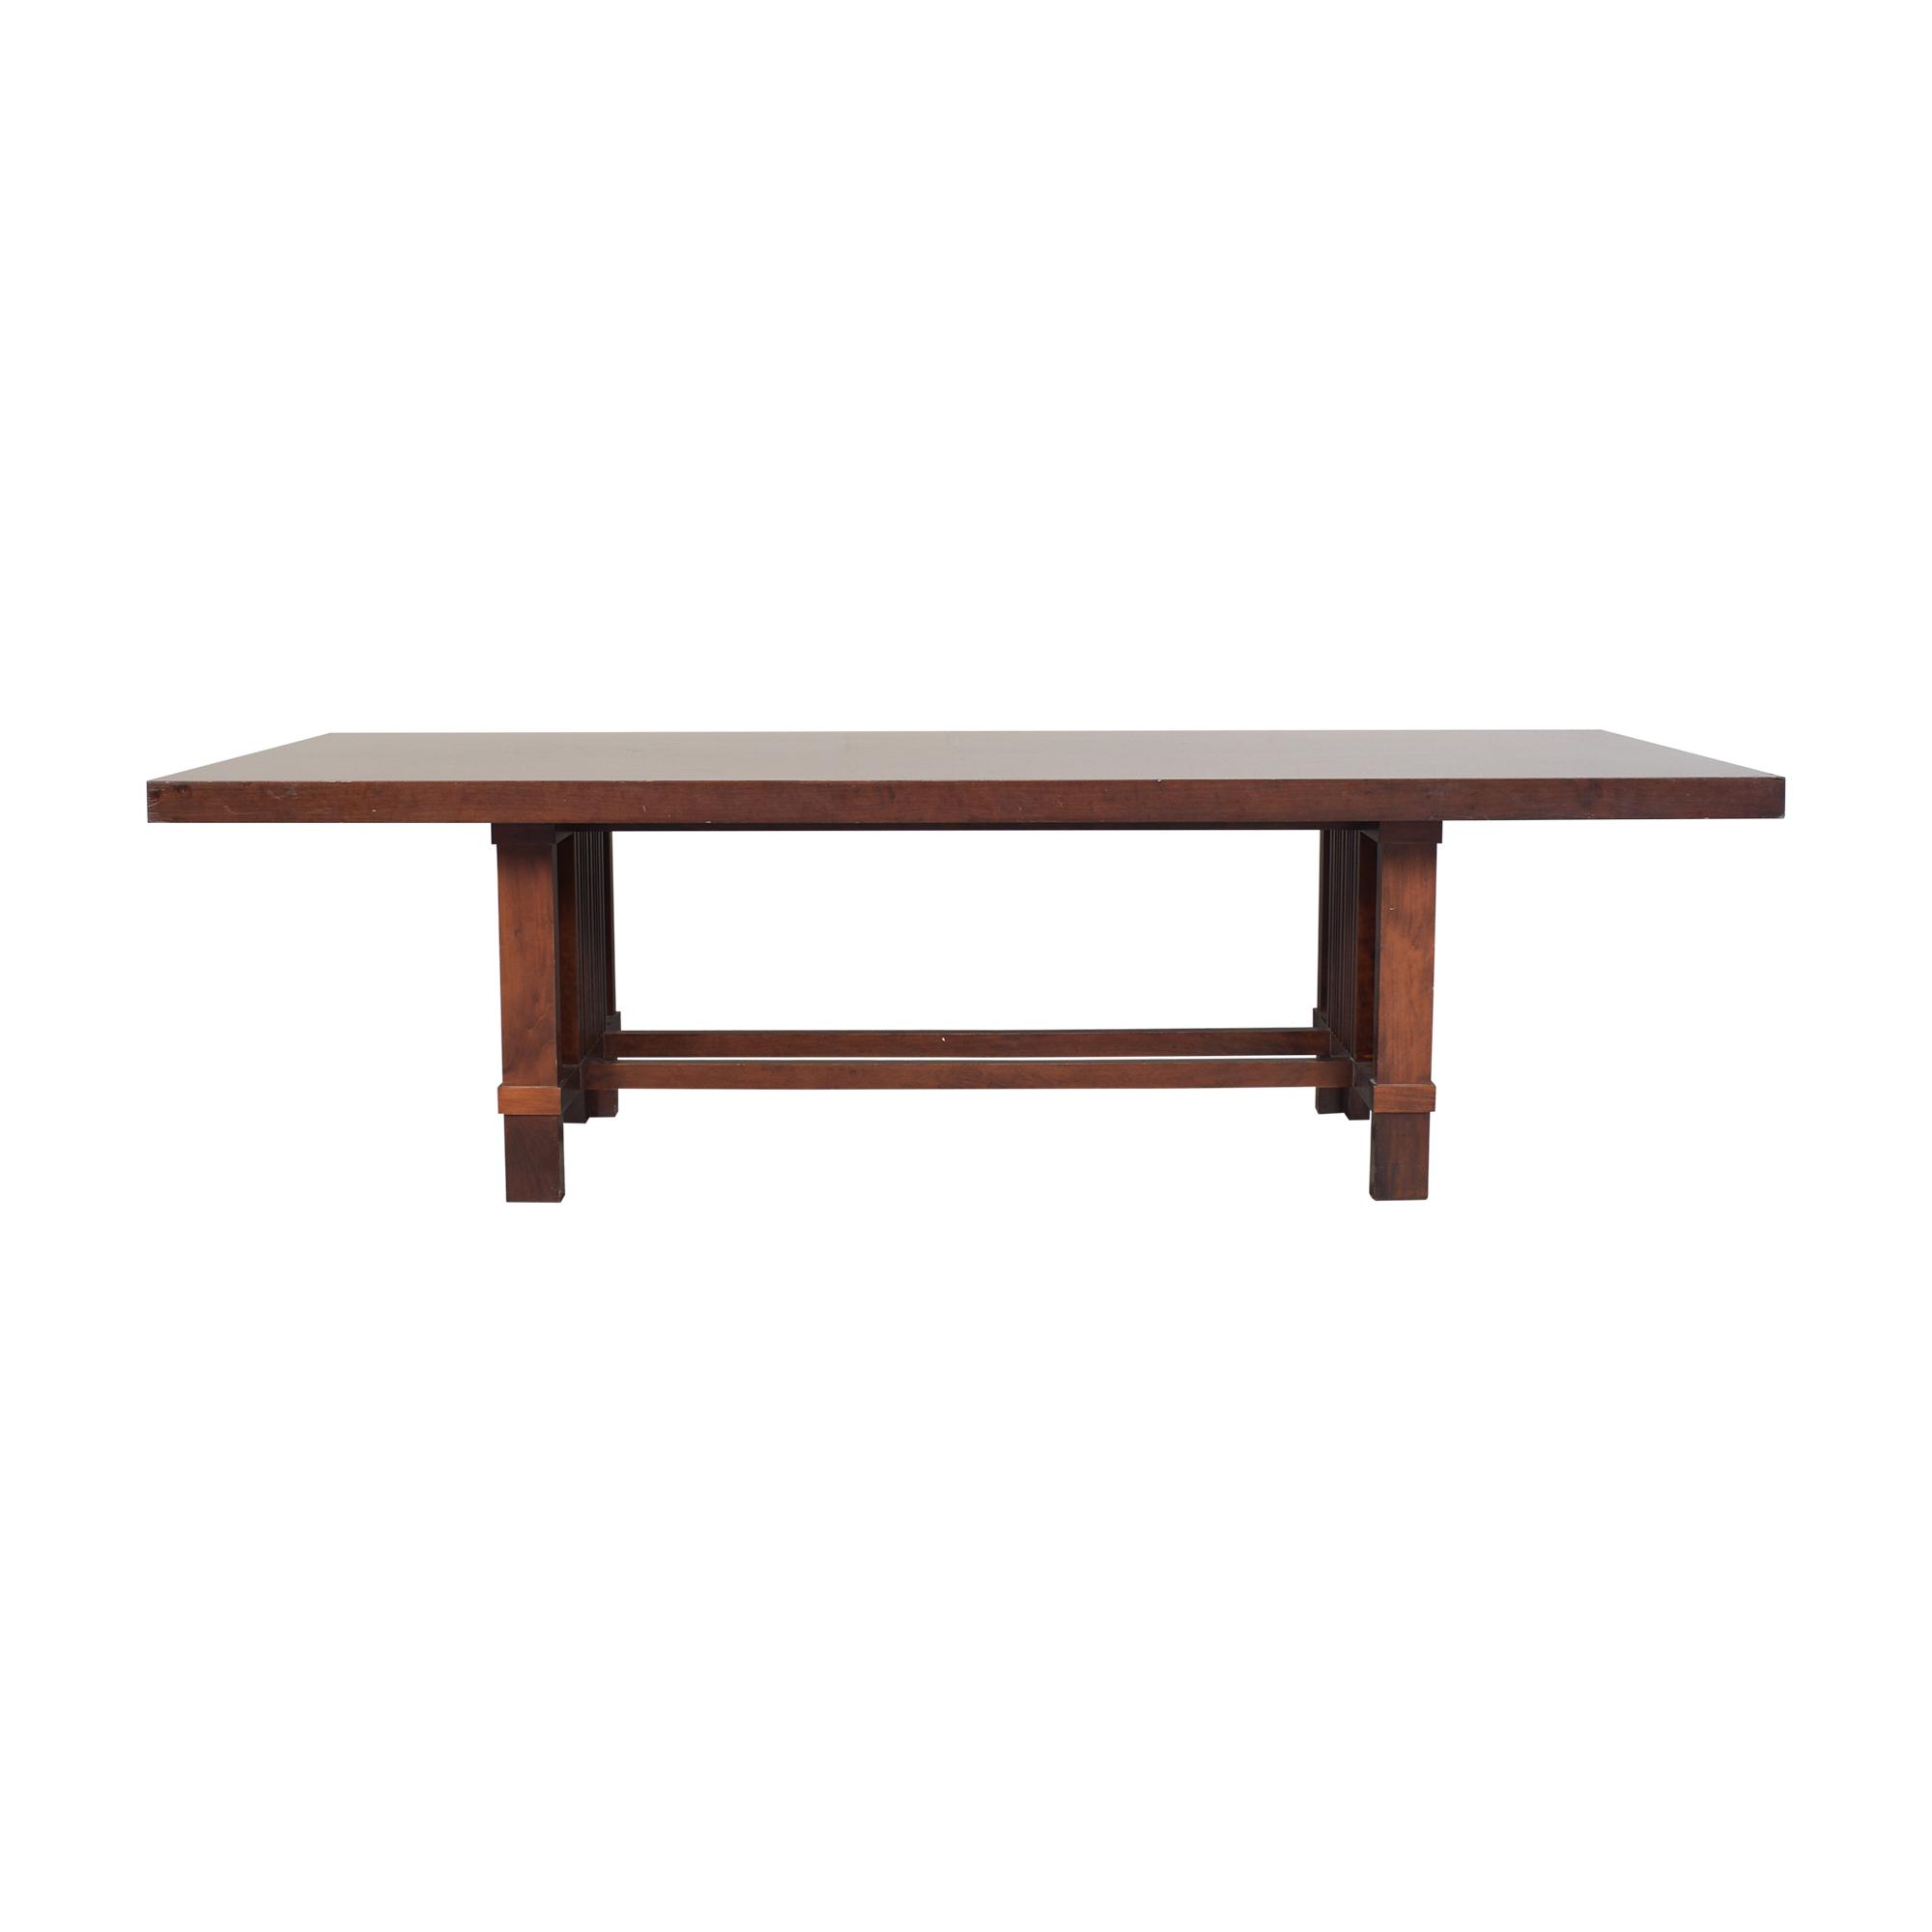 Cassina Cassina Frank Lloyd Wright Taliesin Dining Table price